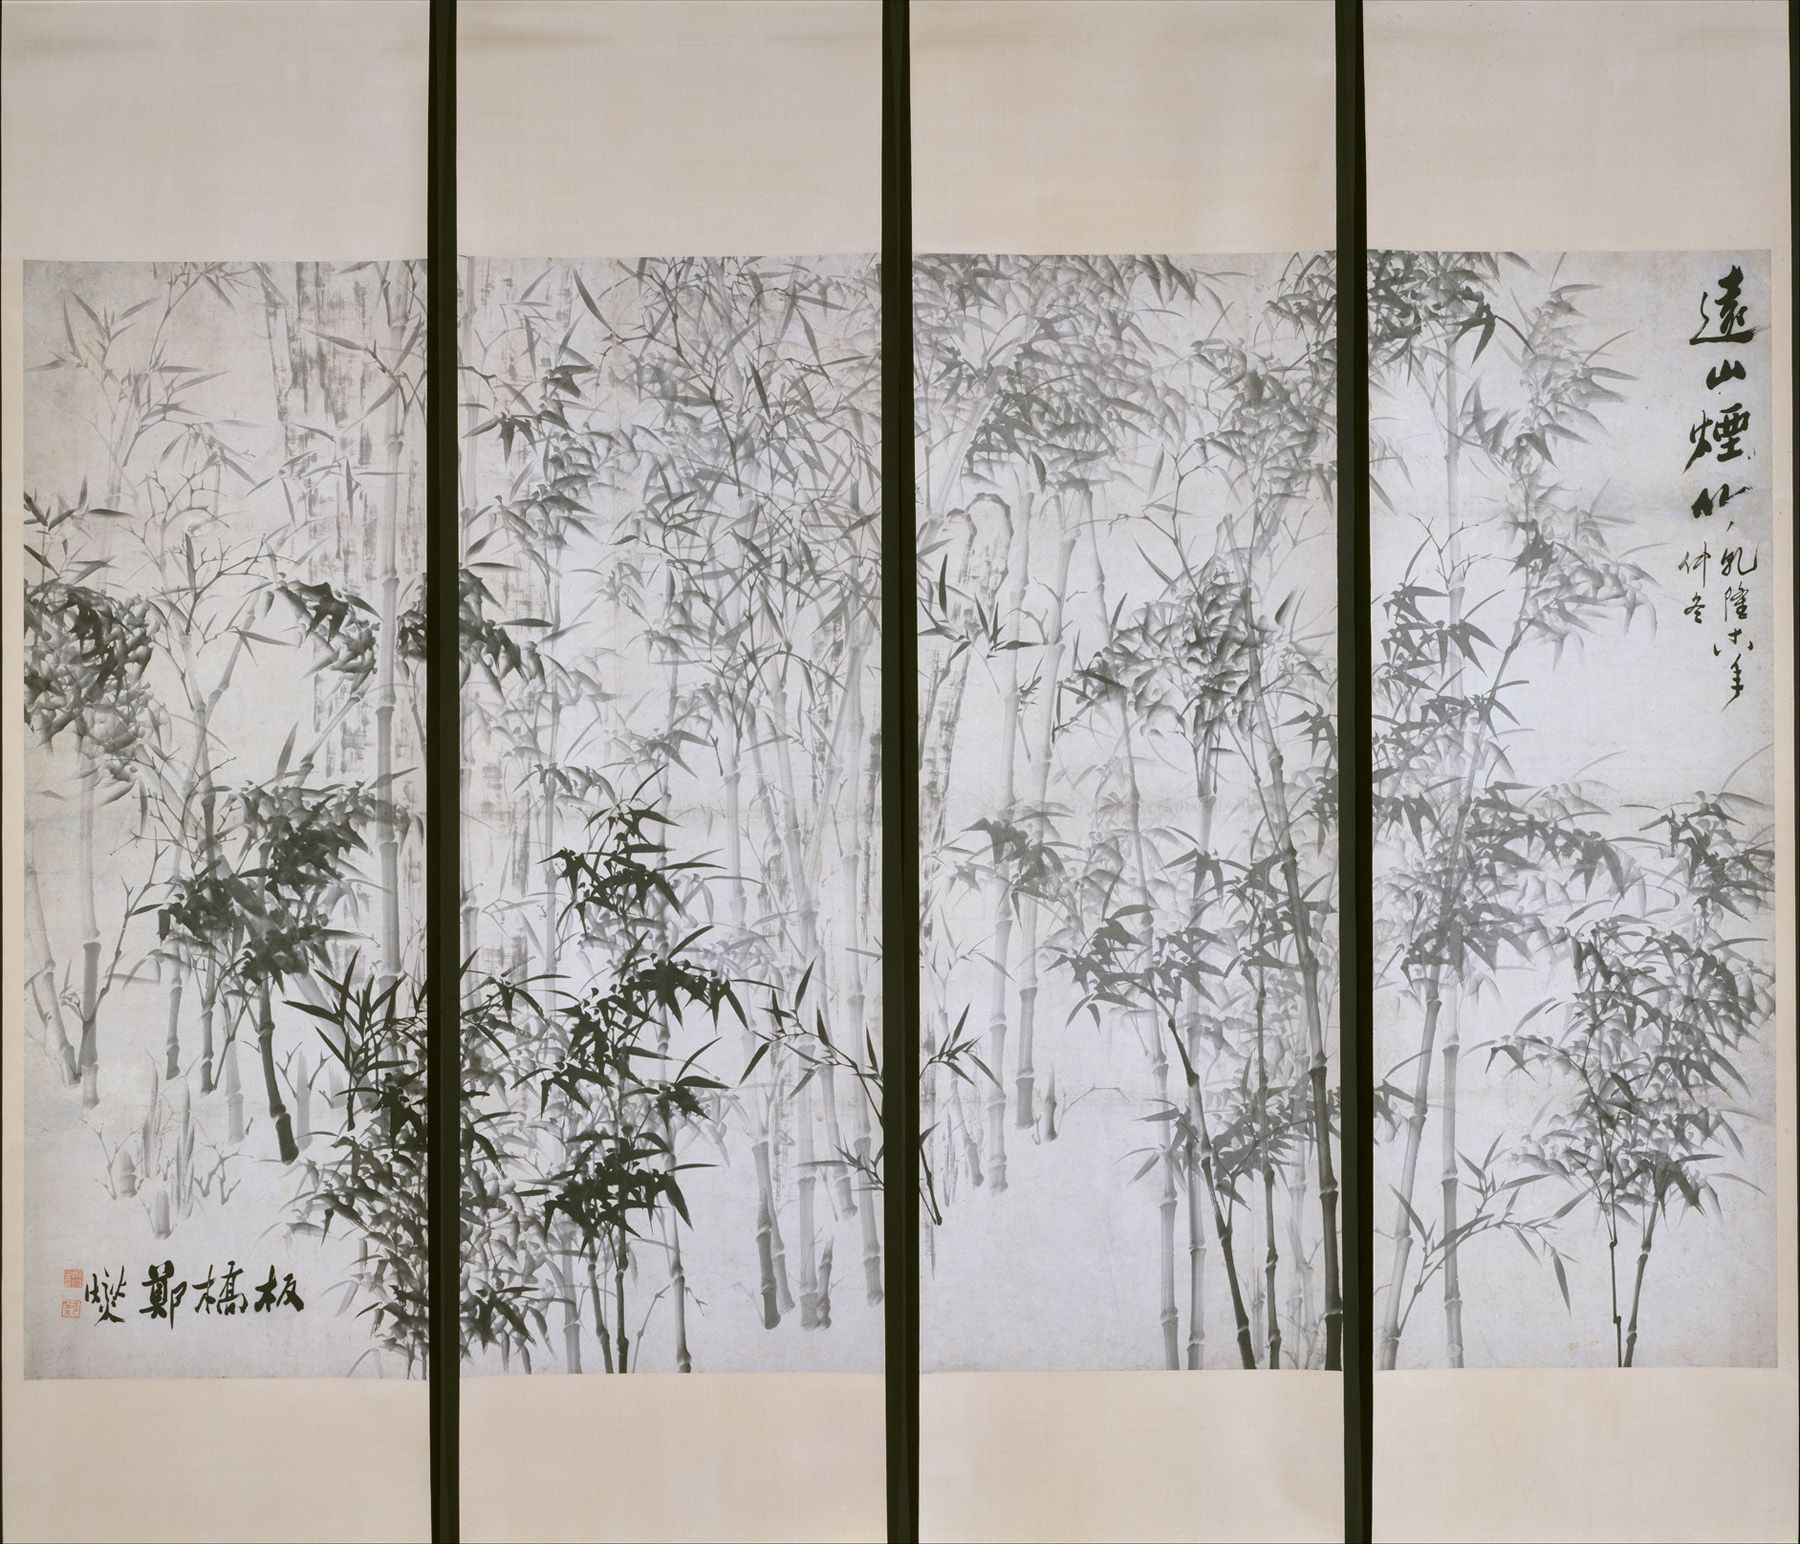 Zheng Xie (鄭燮, 1693-1765), Qing Dynasty (1644-1911)